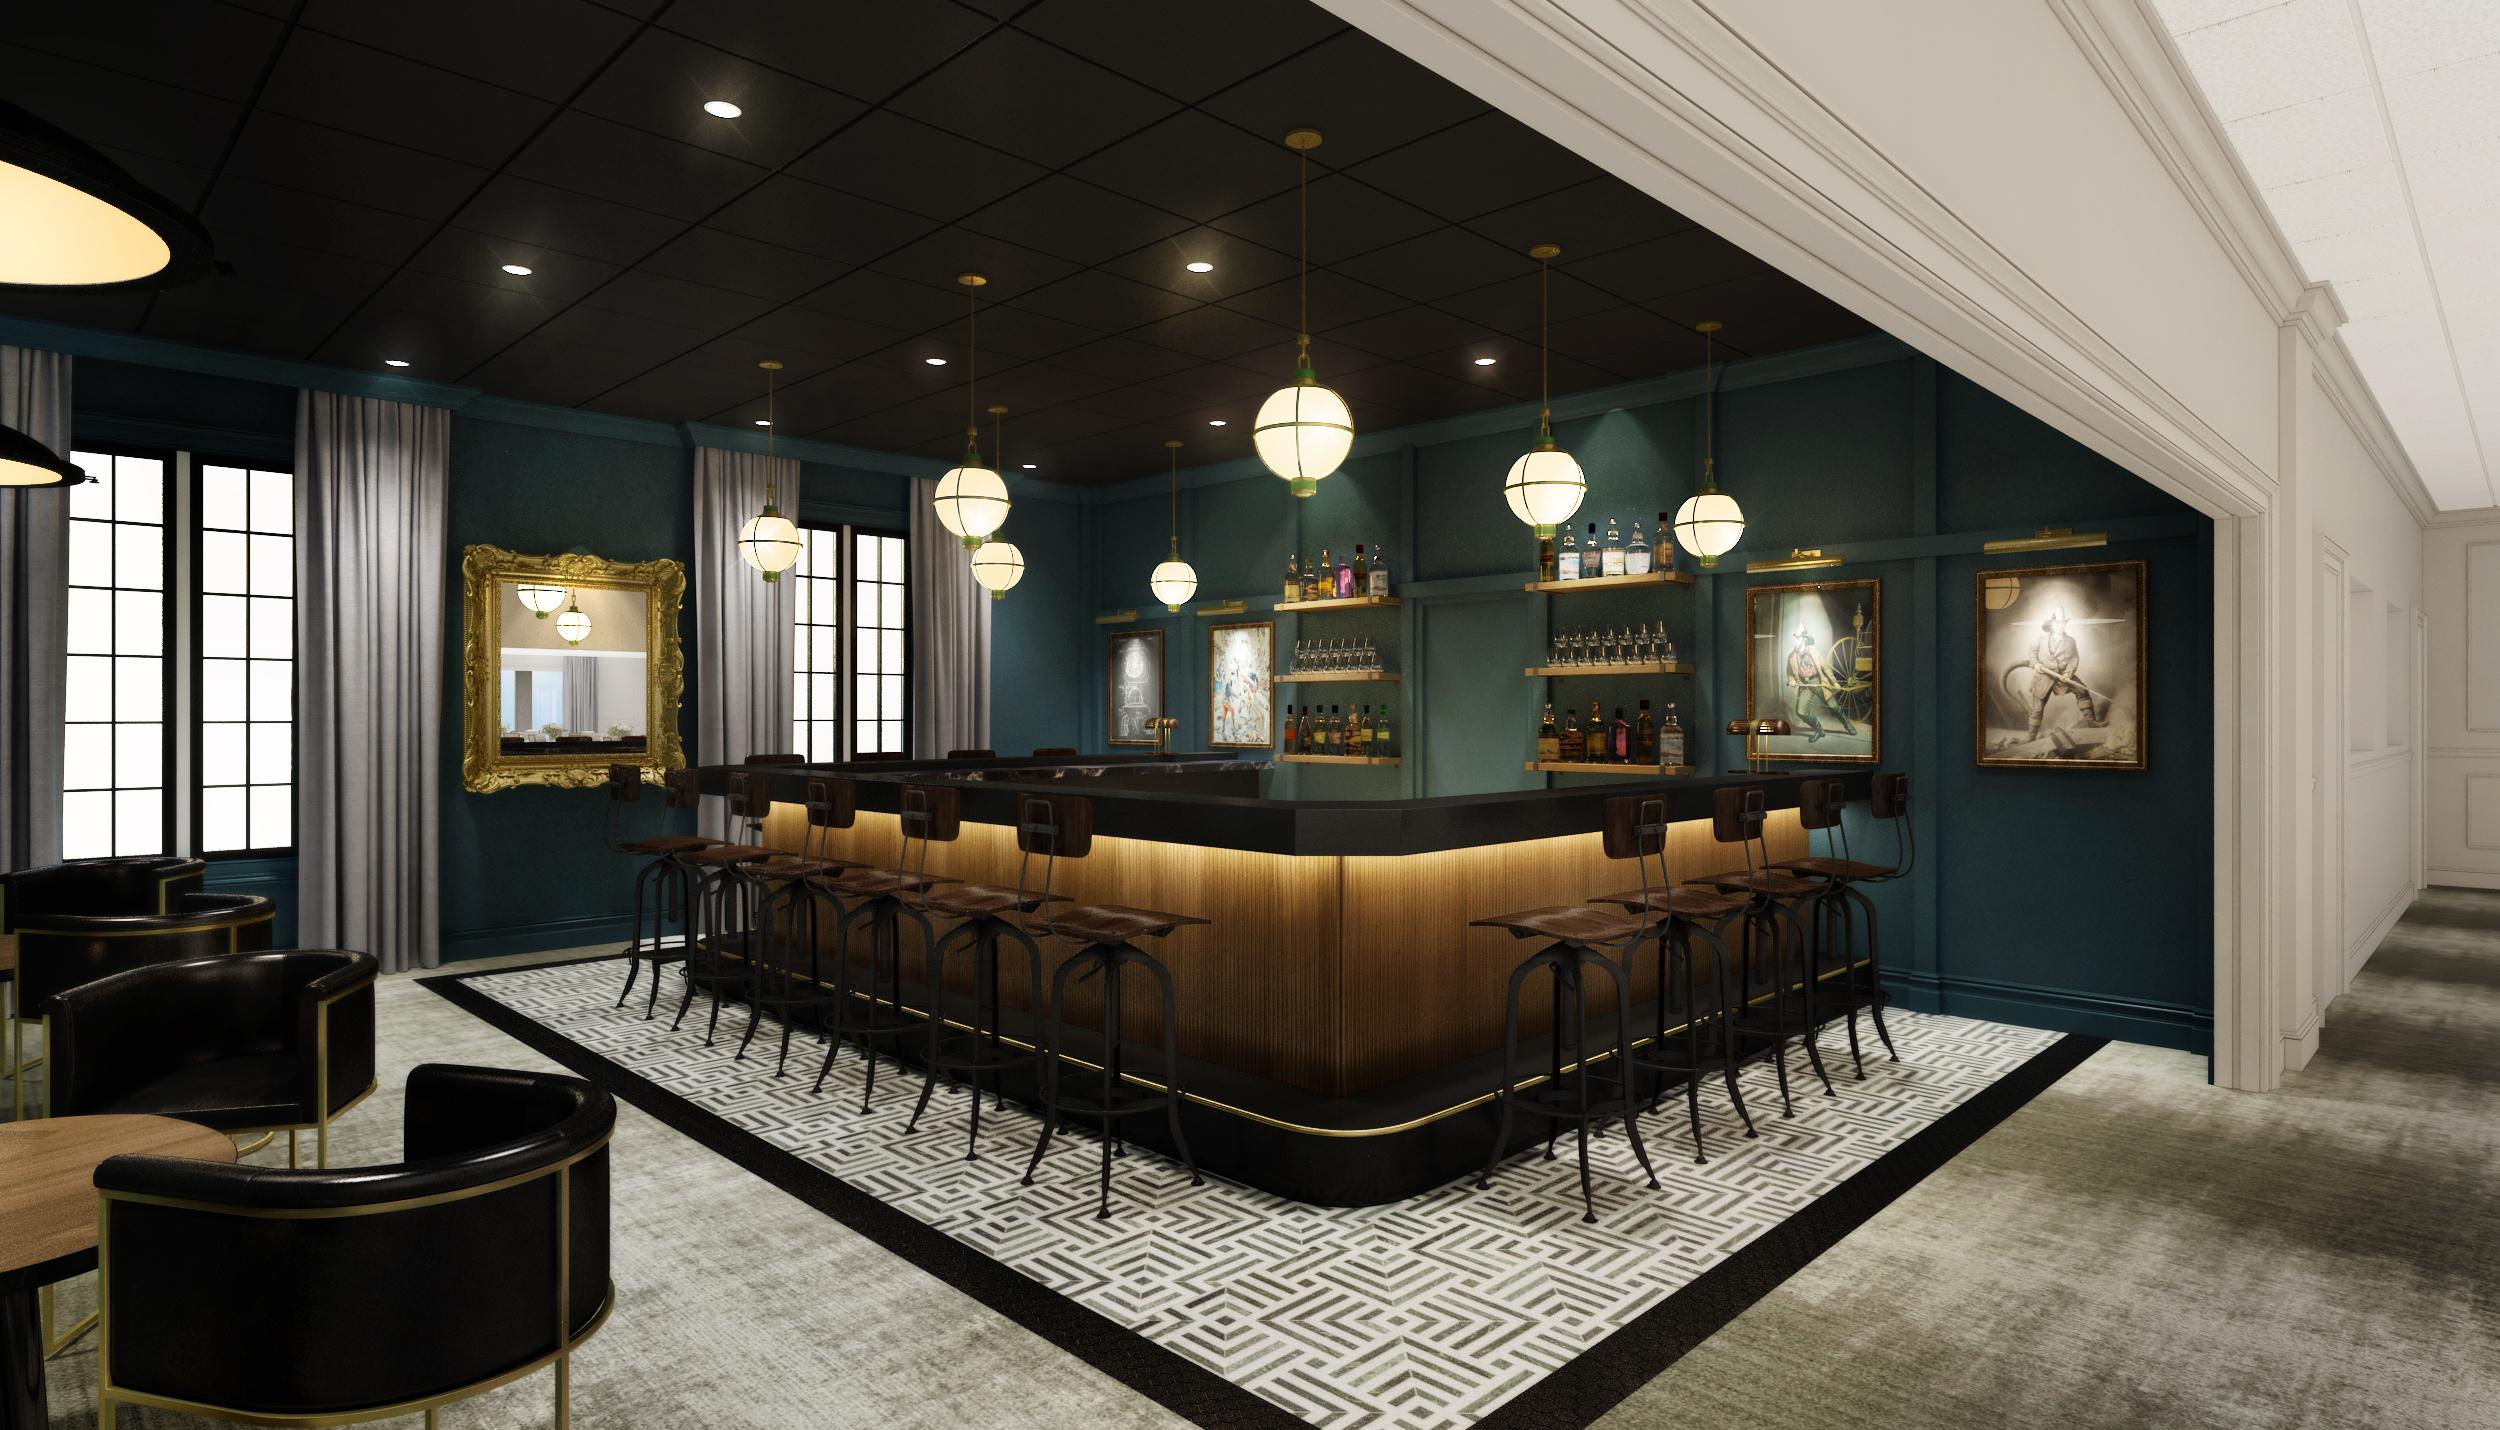 20019_Fire House Banquette Hall_Bar_Fina